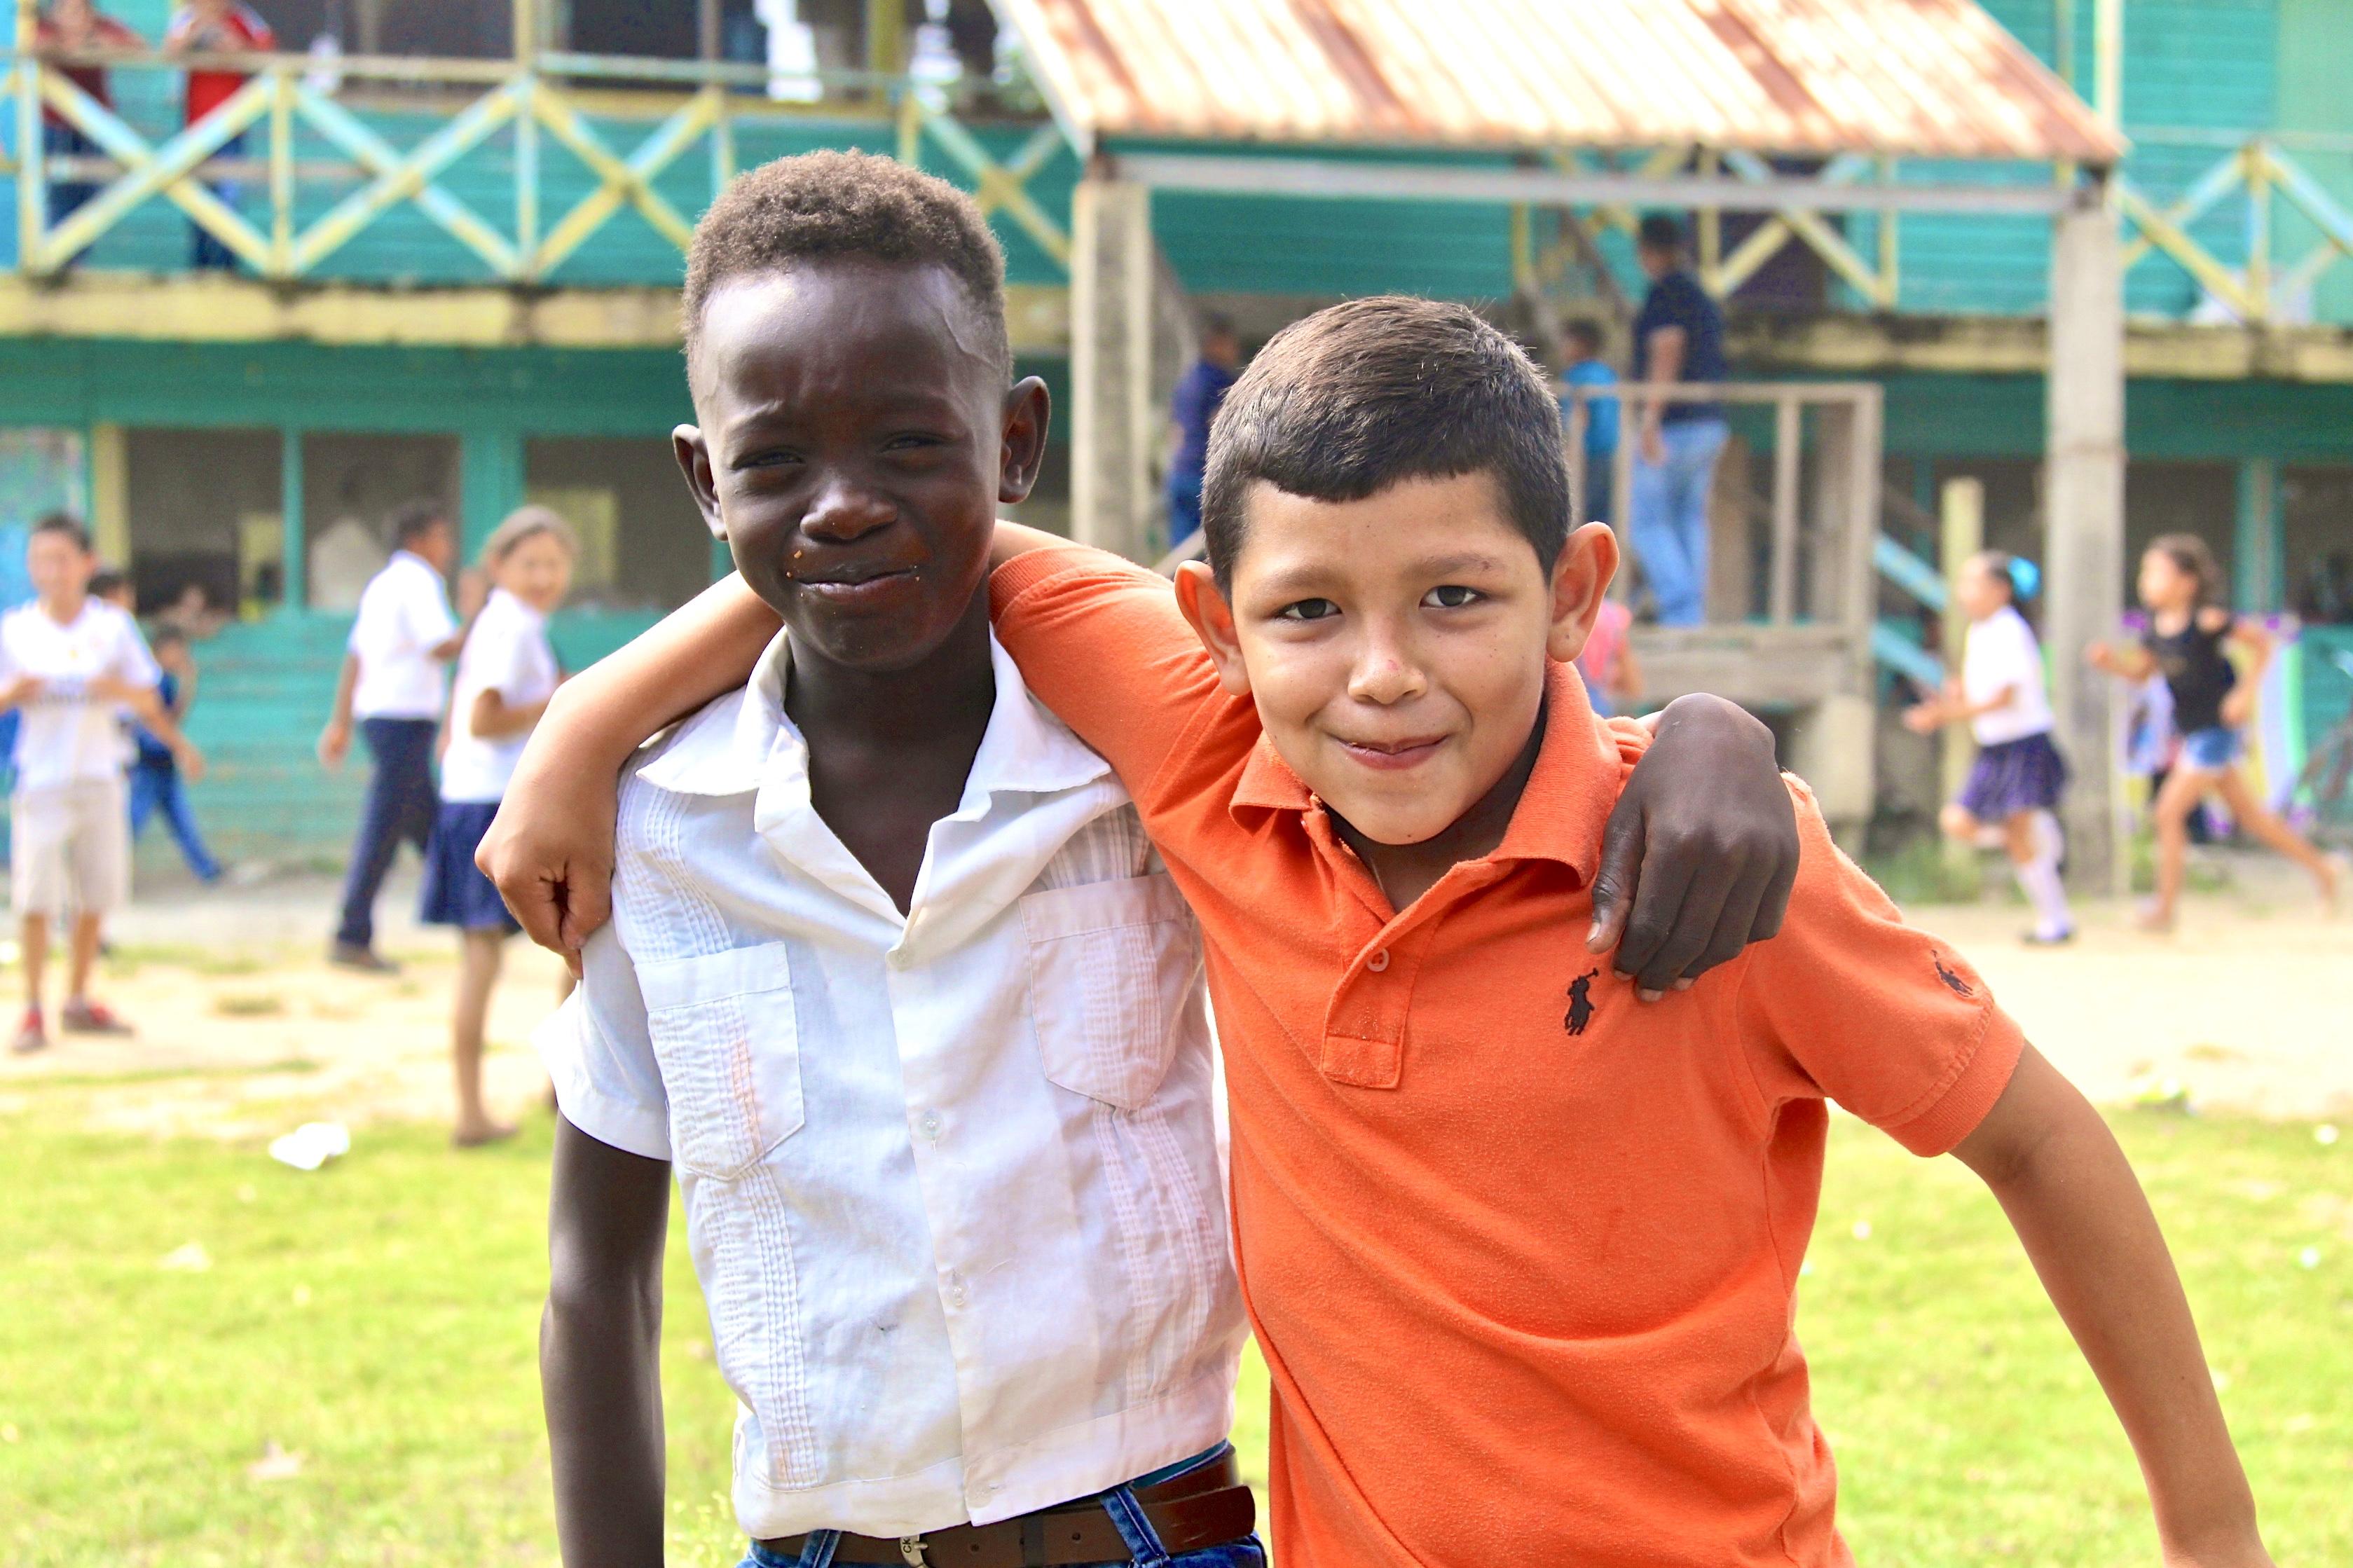 Updates of students at school 50 in honduras